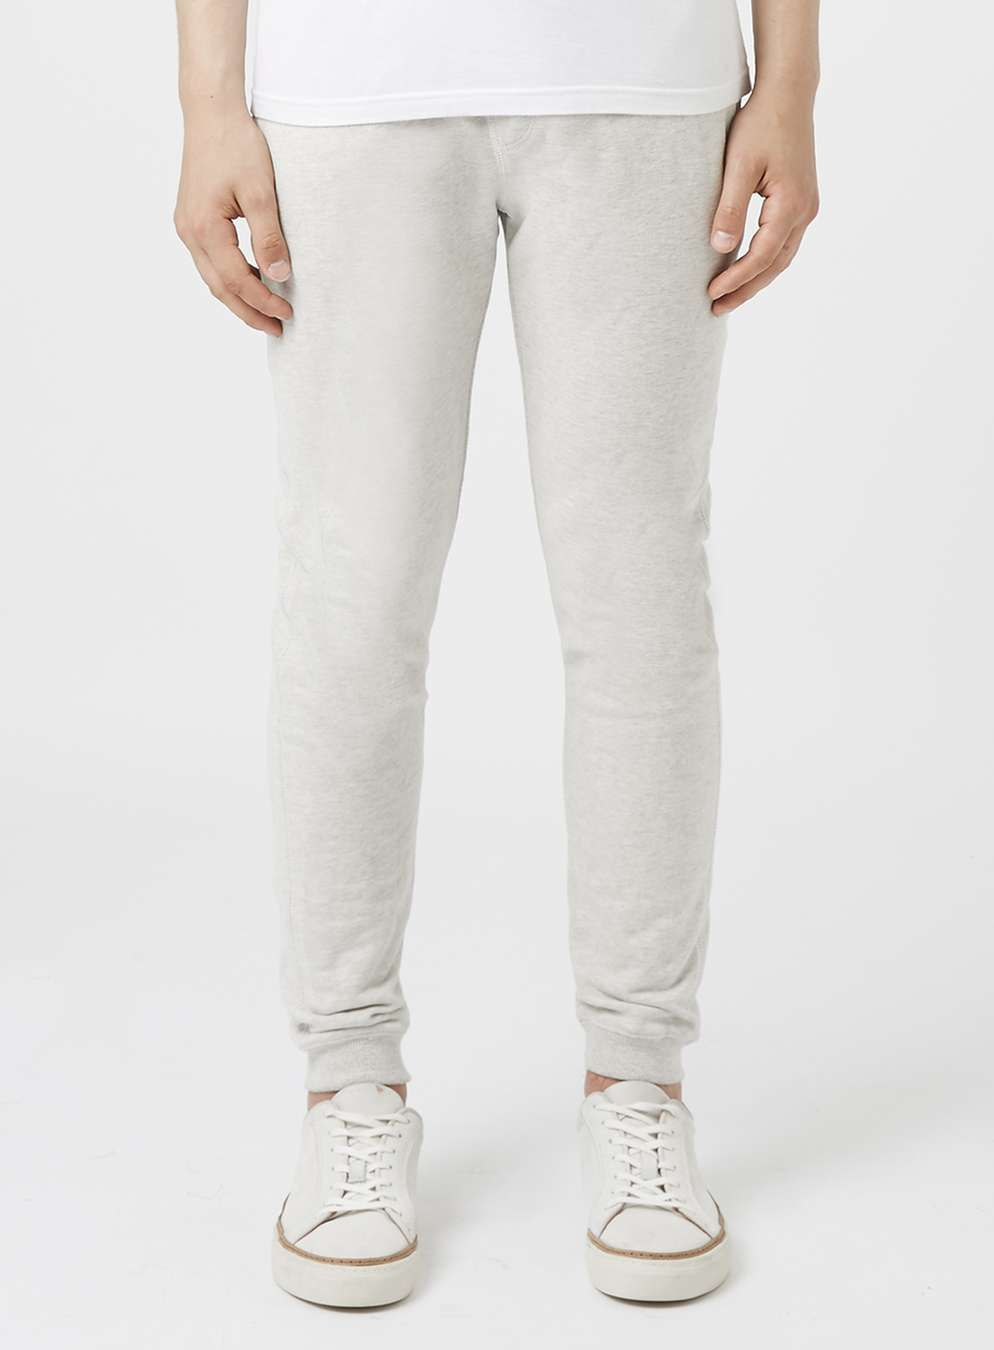 e518dce51e17 Off White Skinny Joggers - Pants - Clothing